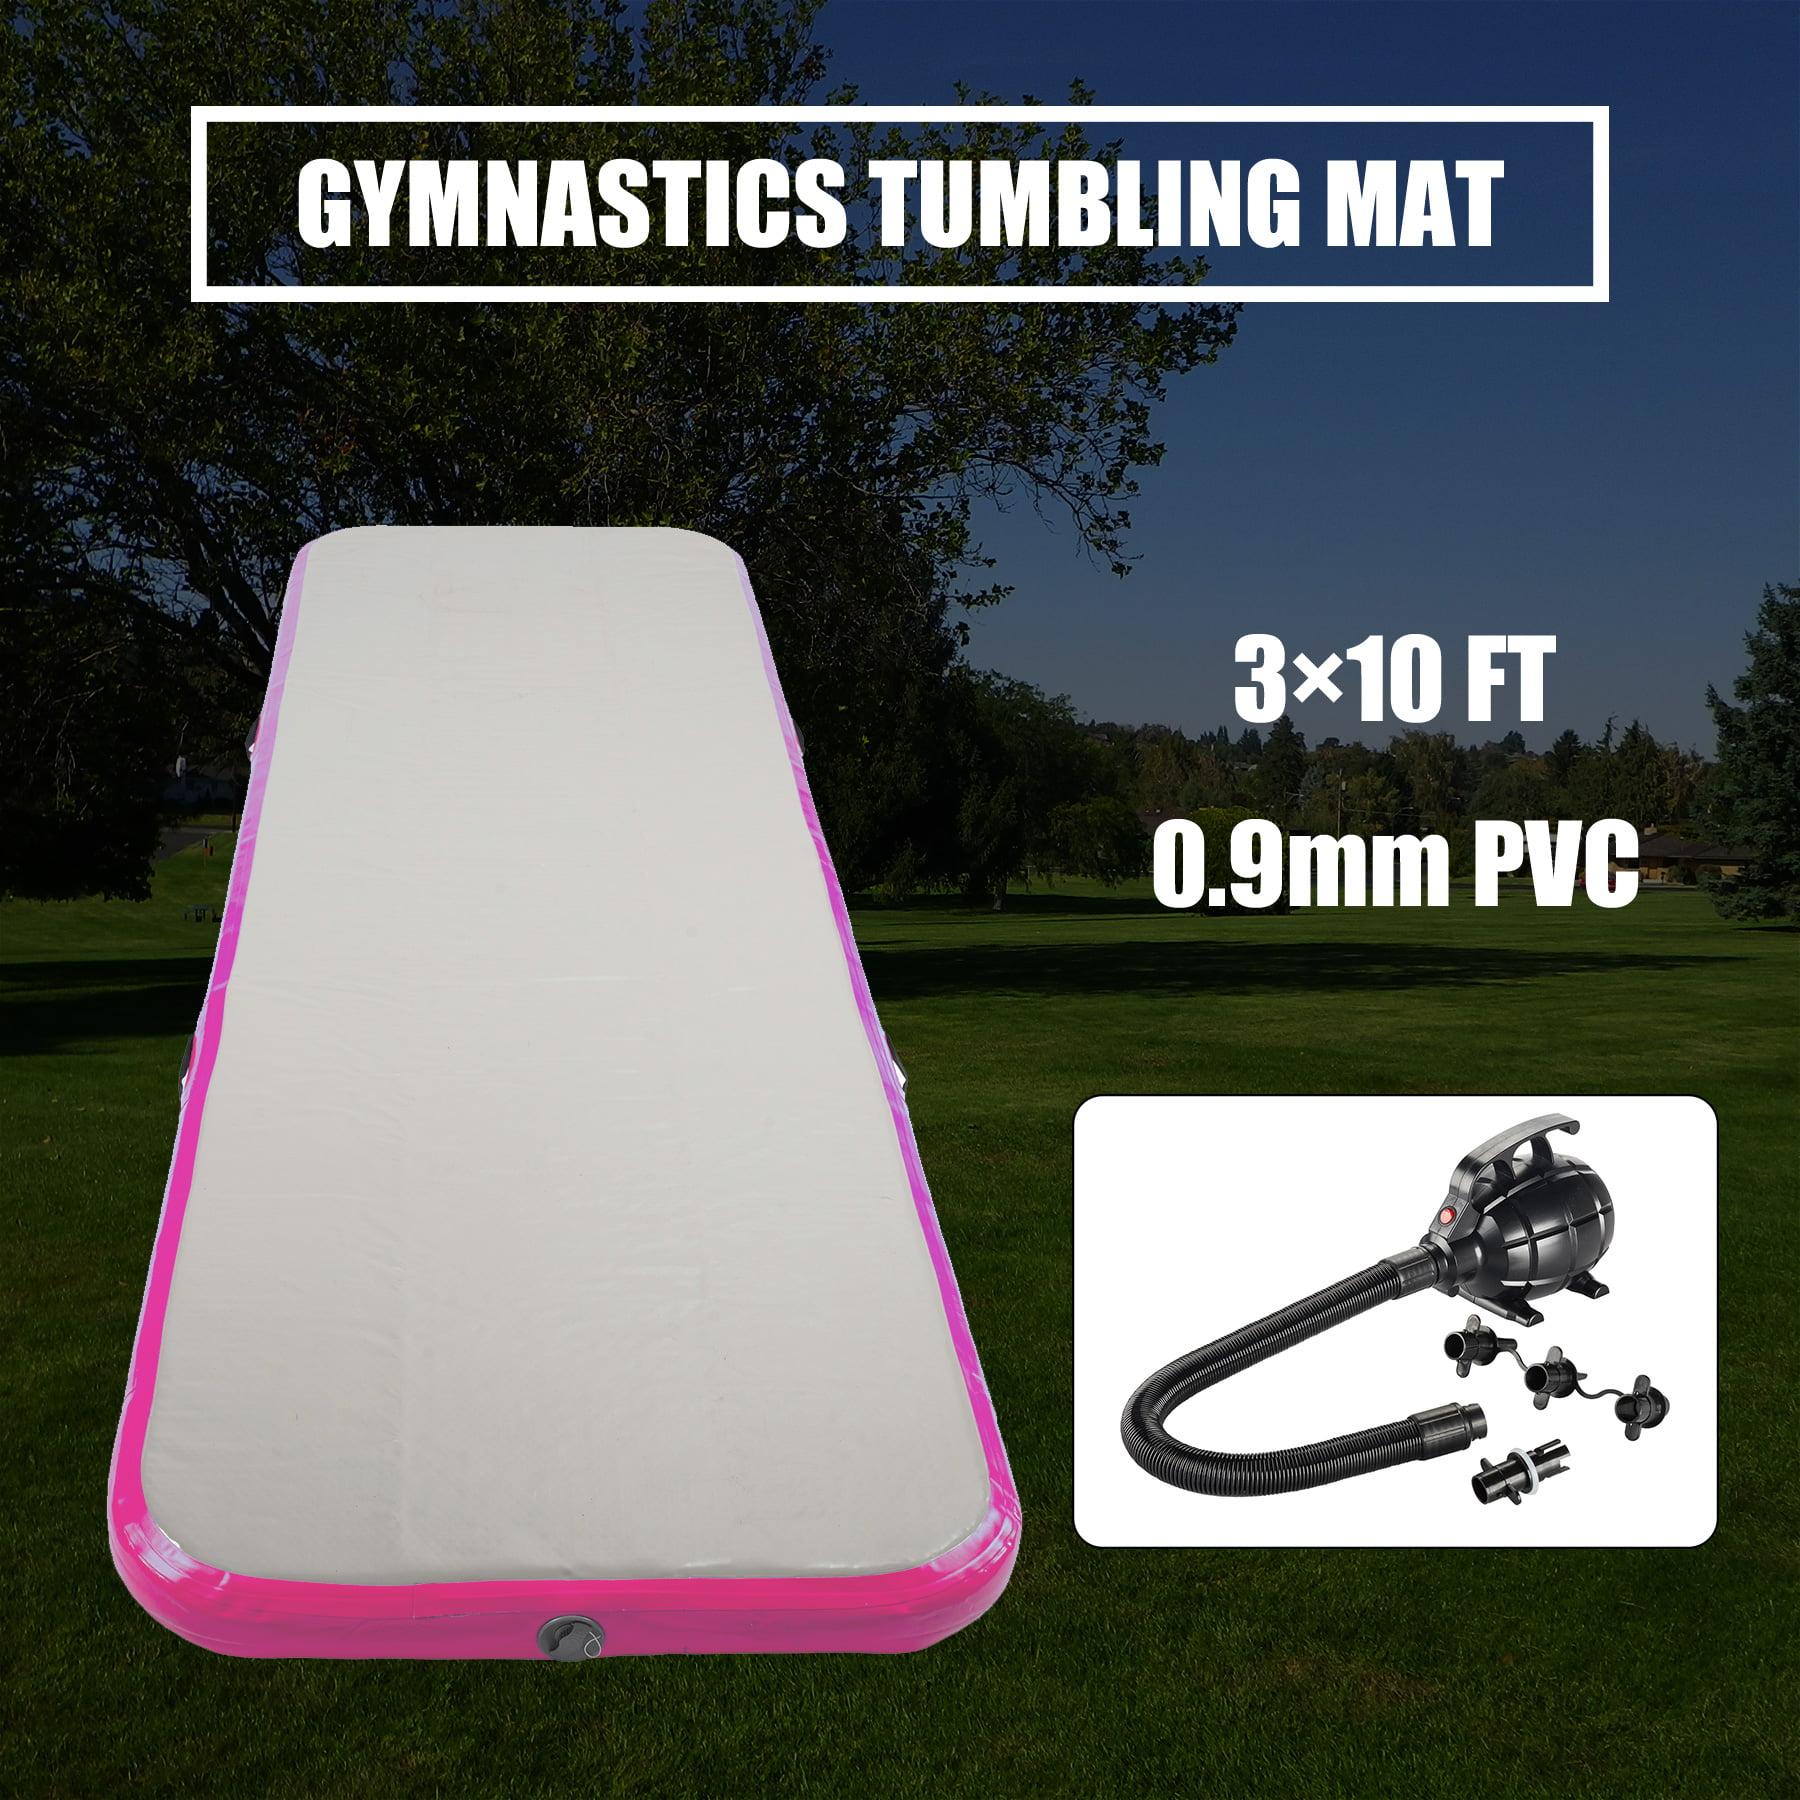 Inflatable Gymnastics Tumbling Mat Air Floor Air Track w Electric Air Pump by